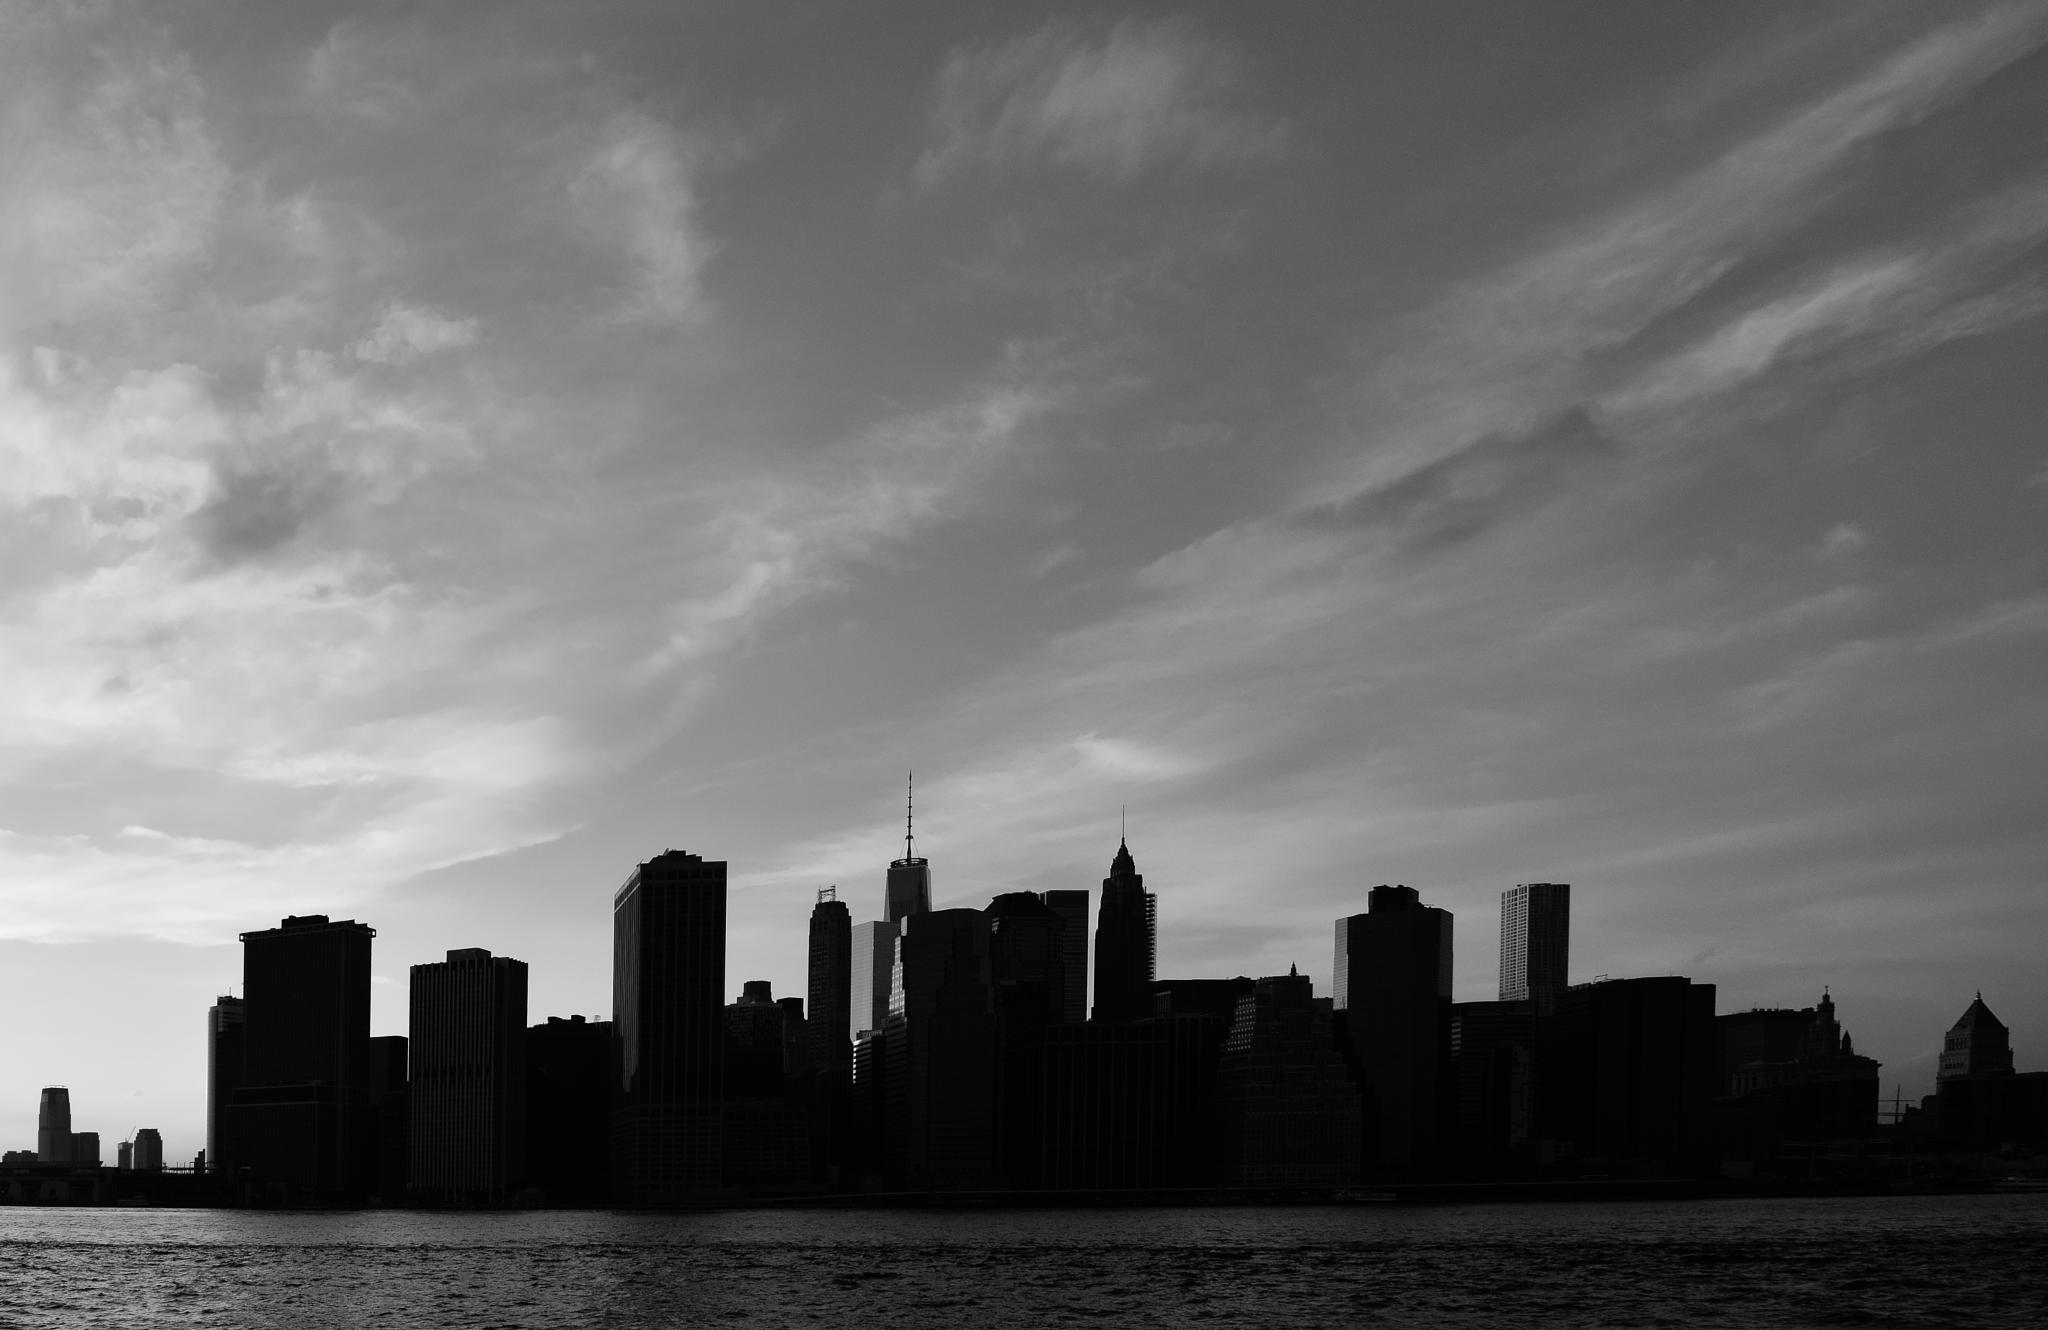 Untitled by Newyorkexposure